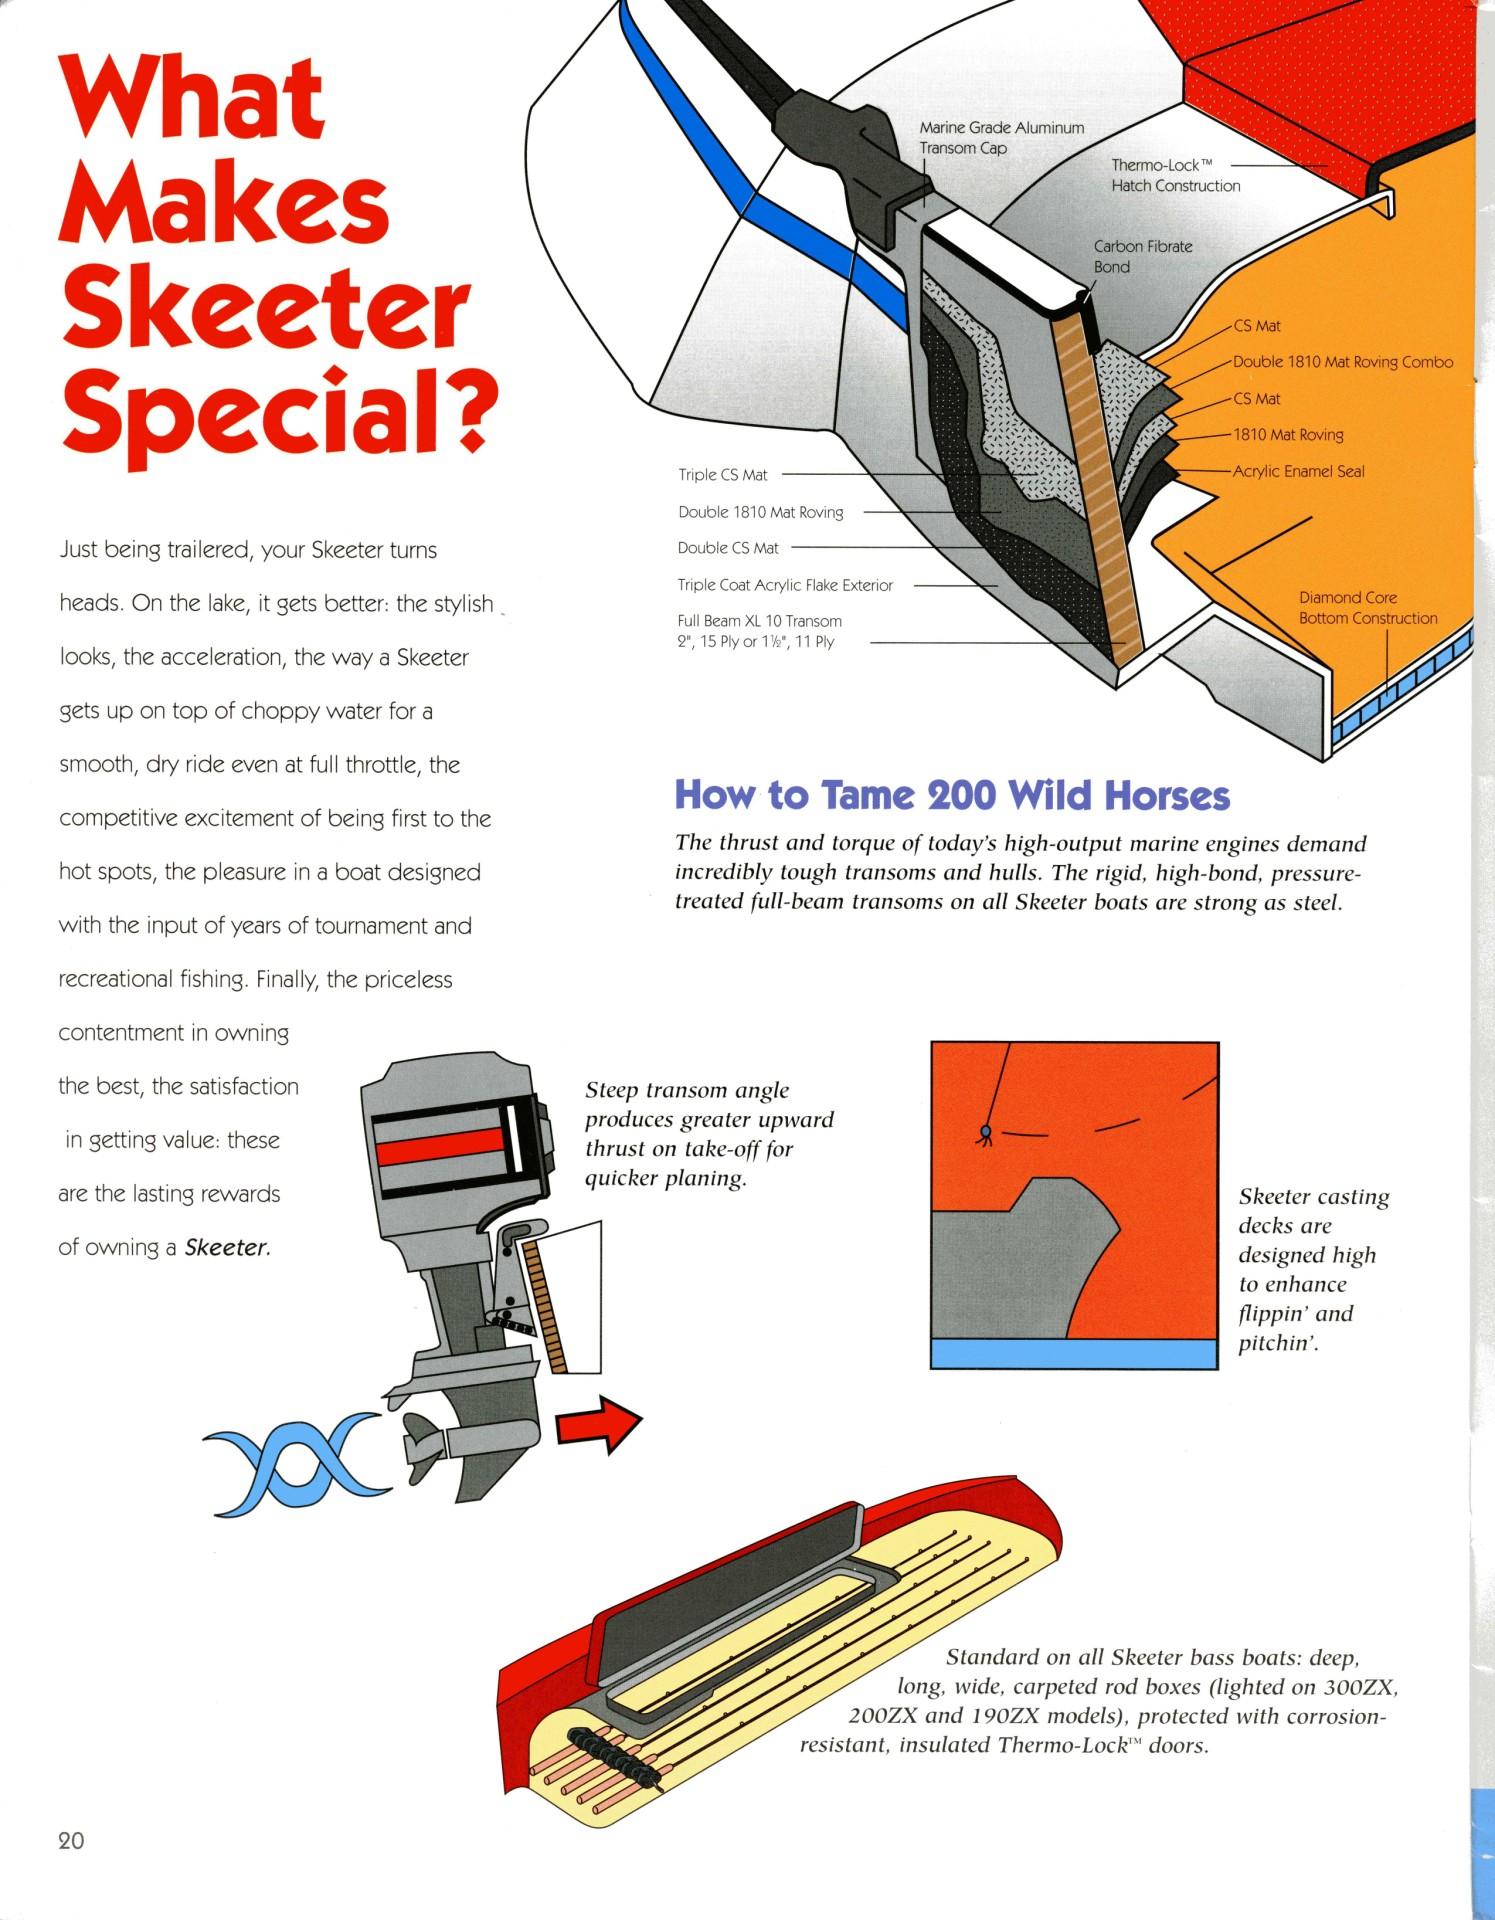 Skeeter Bass Boat Wiring Diagram On Switch Wiring Diagram Champion